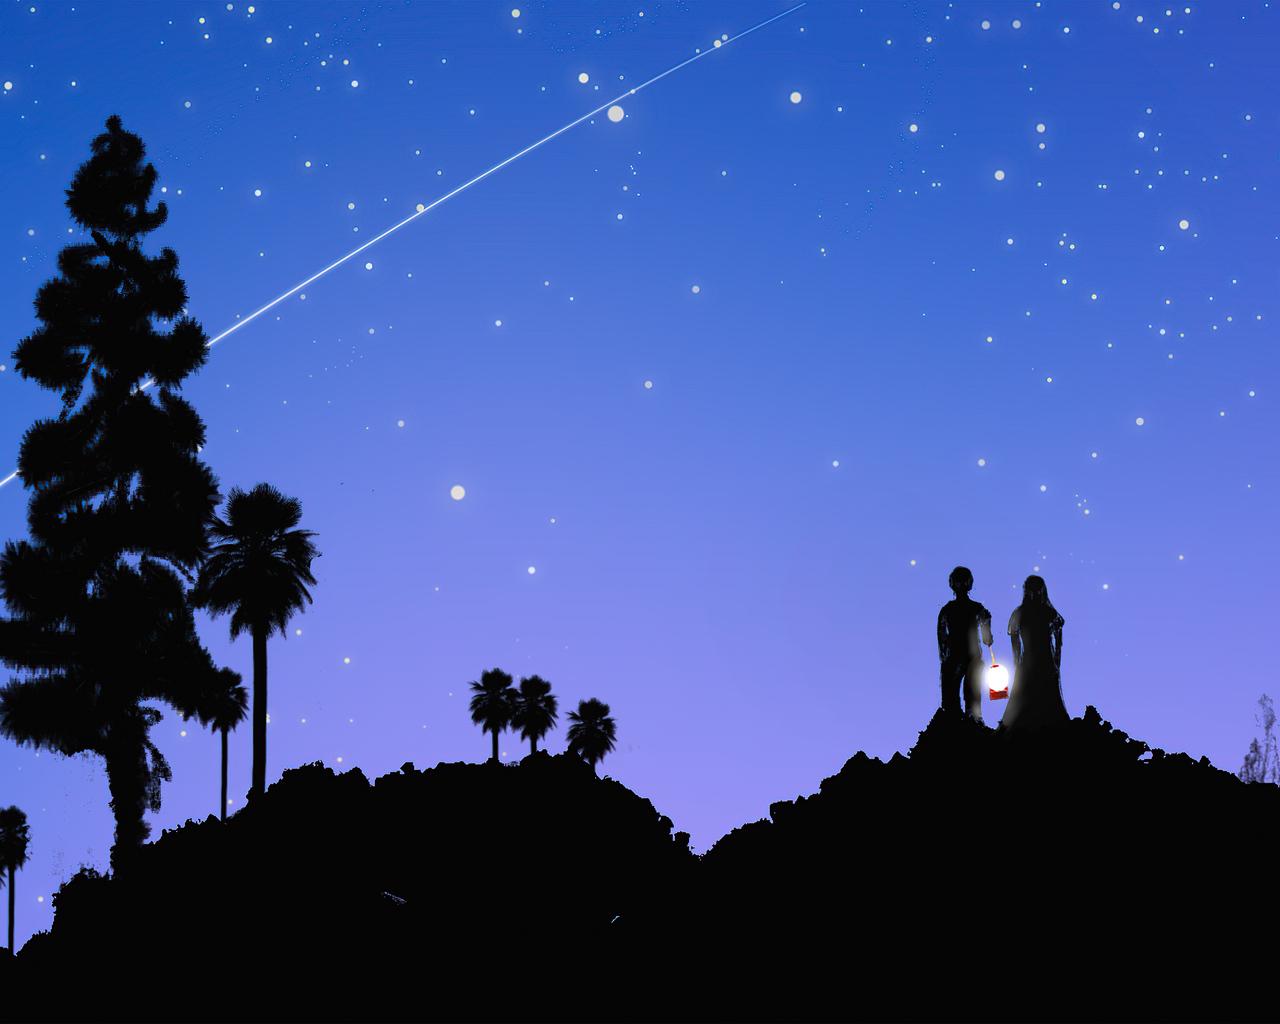 couple-at-starrty-night-watching-stars-and-meteorite-5k-ge.jpg